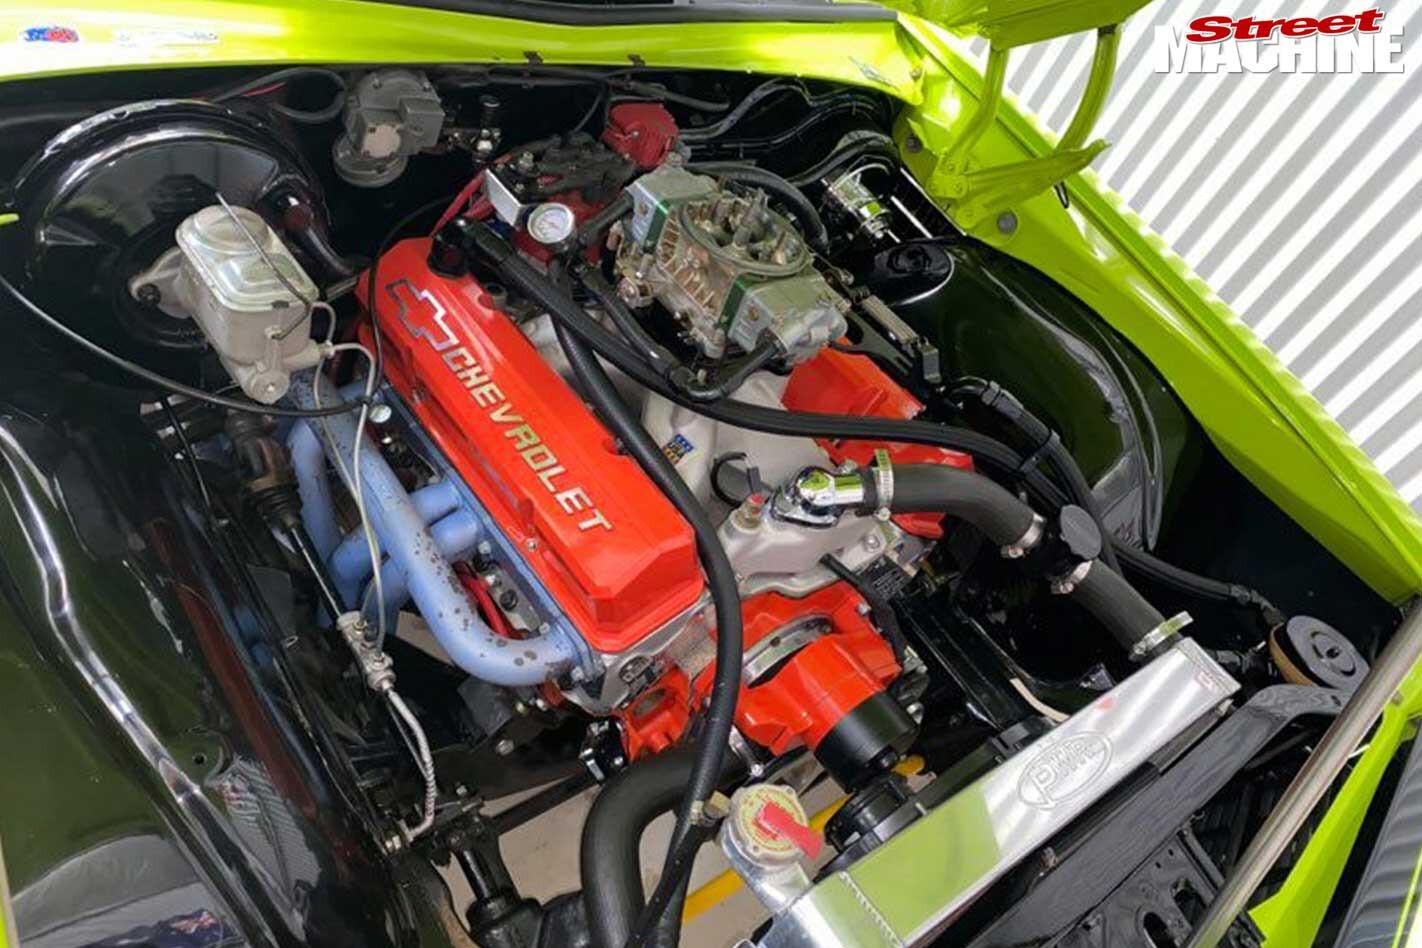 Holden Monaro HQ GTS engine bay